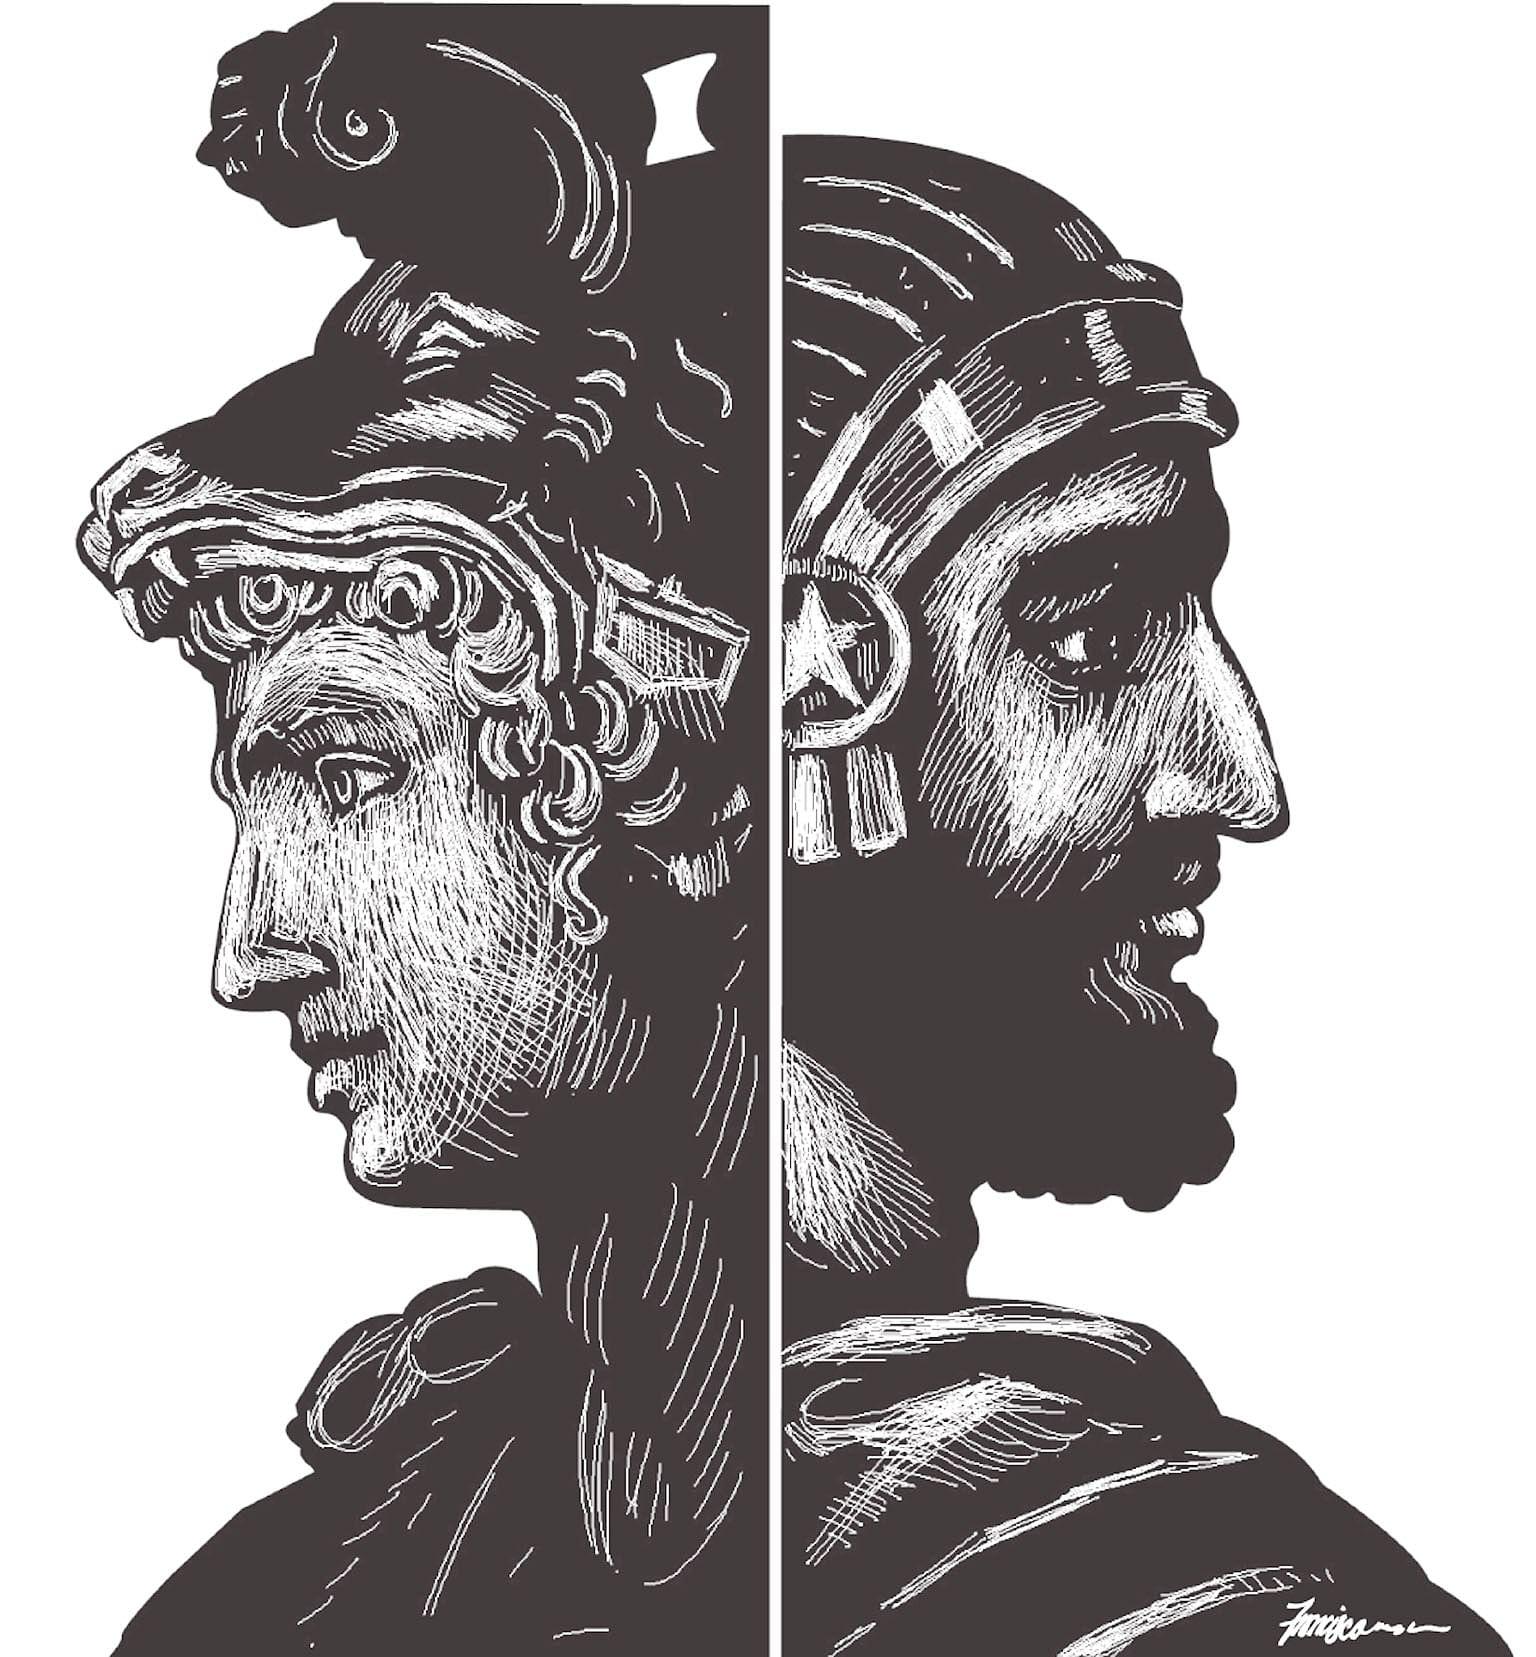 was alexander the great also known as iskandar zulkarnain opinion